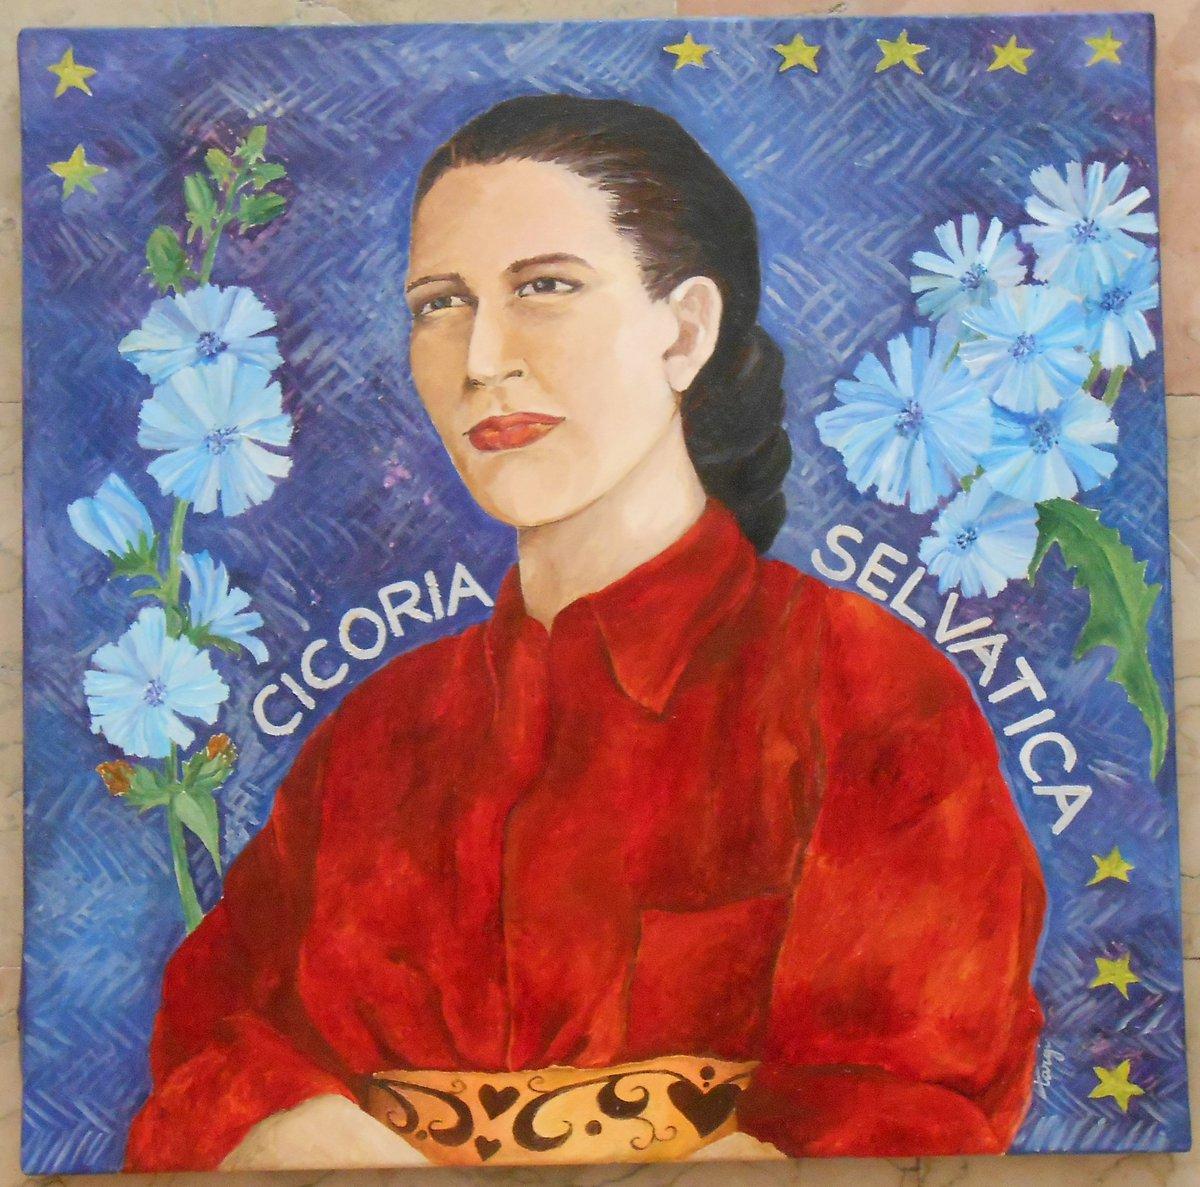 MA-DONNA CICORIA SELVATICA opera-poesia, leggi la poesia clicca il linkhttps://ma-donne.blogspot.com/2016/01/ma-donna-cicoria-selvatica.html#poesia #VentagliDiParole @CasaScrittori #PoesiaInTweet#MondoDiVersi #ScrivoArte #arte #parole #PoesiaPerLaSera #outsiderat #art #ArtLovers #ArtistOnTwitter  - Ukustom